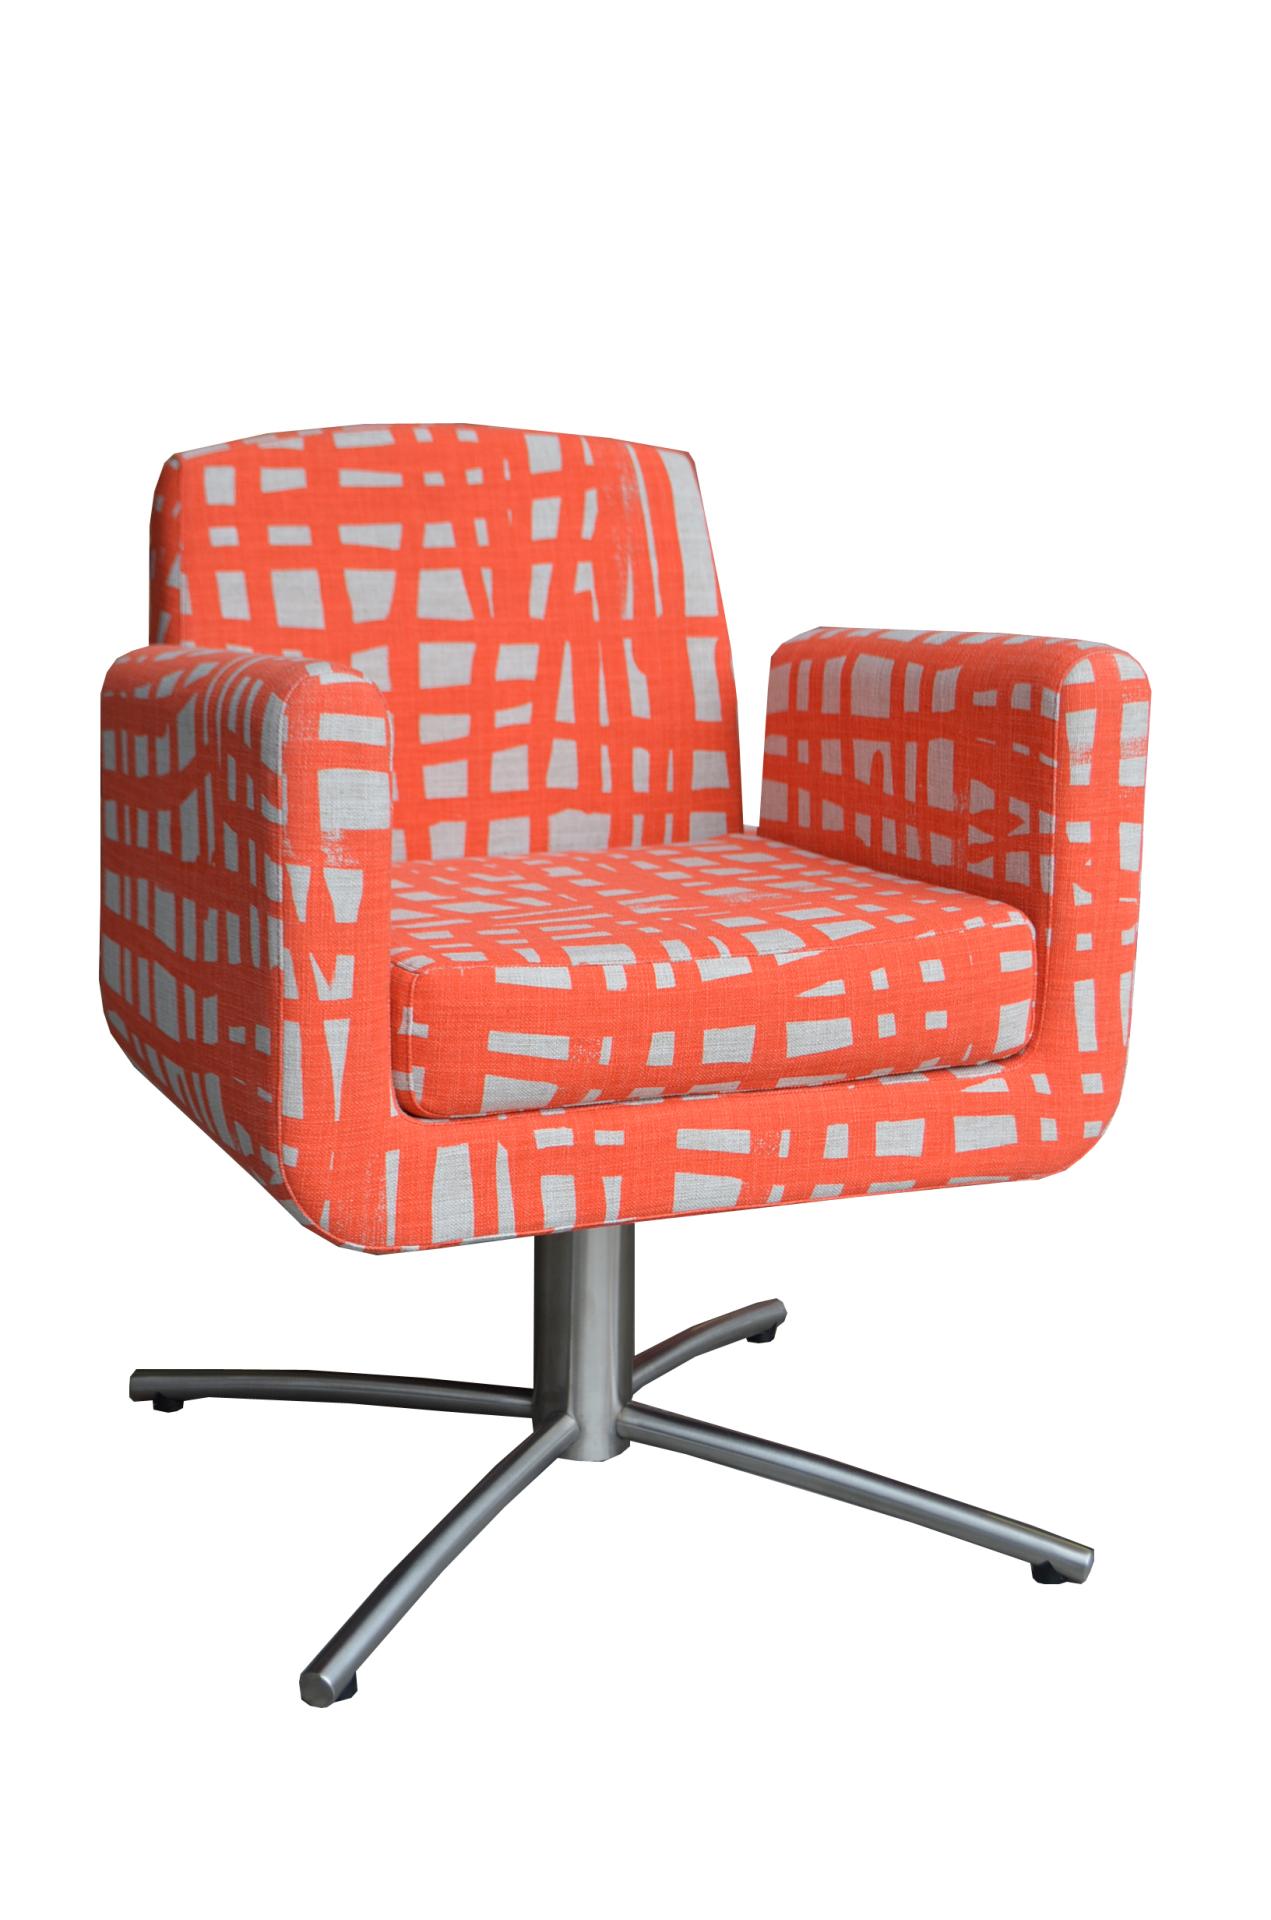 Direct Ergonomics   Sydney Office Furniture   Ergonomic Furniture   Collaborative Seating   Waiting Lounges   Waiting Room Seating   Ergonomic Seating   Eeni